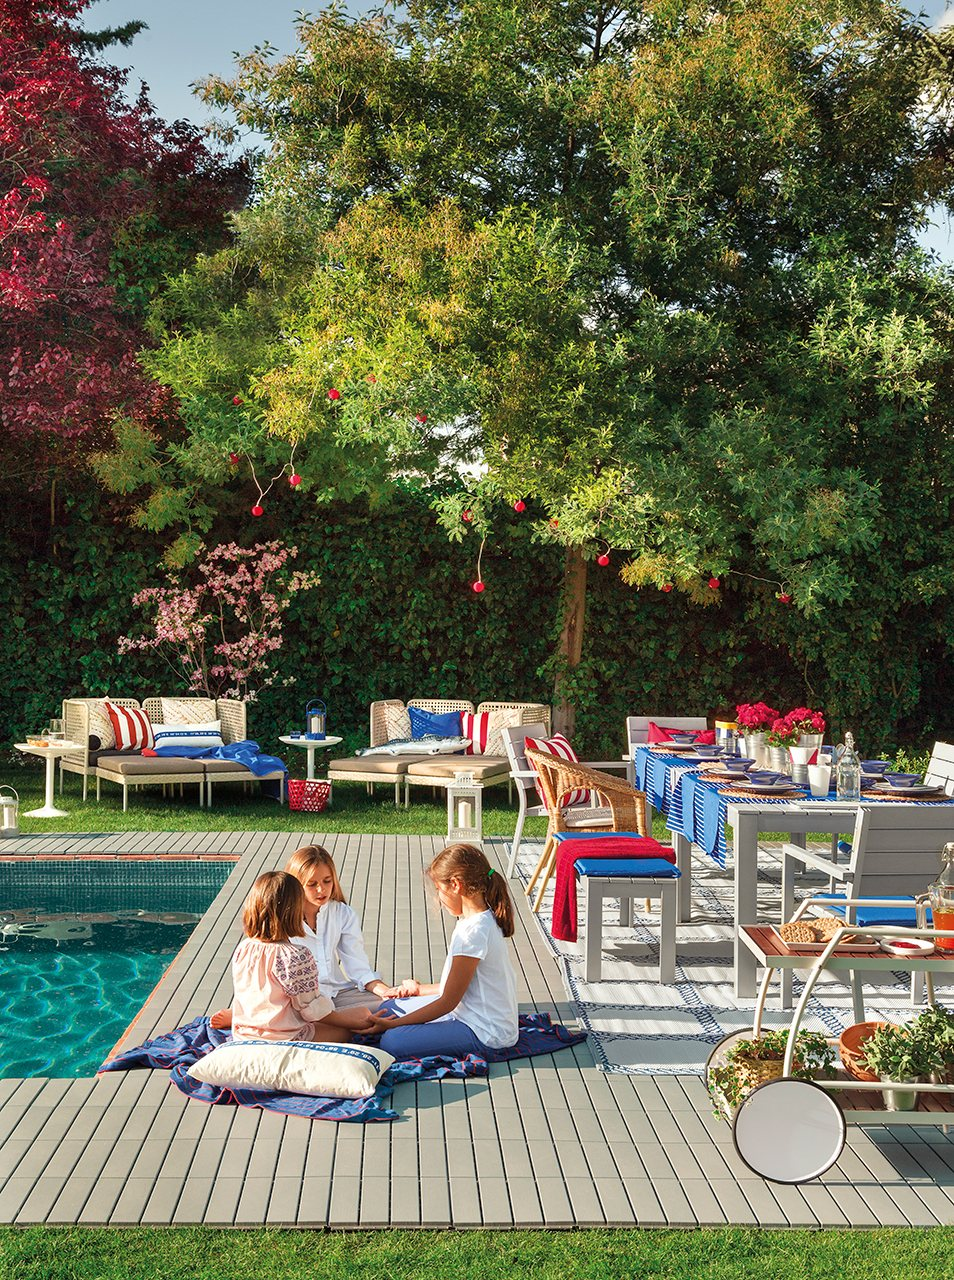 Porche terraza piscina vive el exterior - Mesa de jardin ikea la rochelle ...